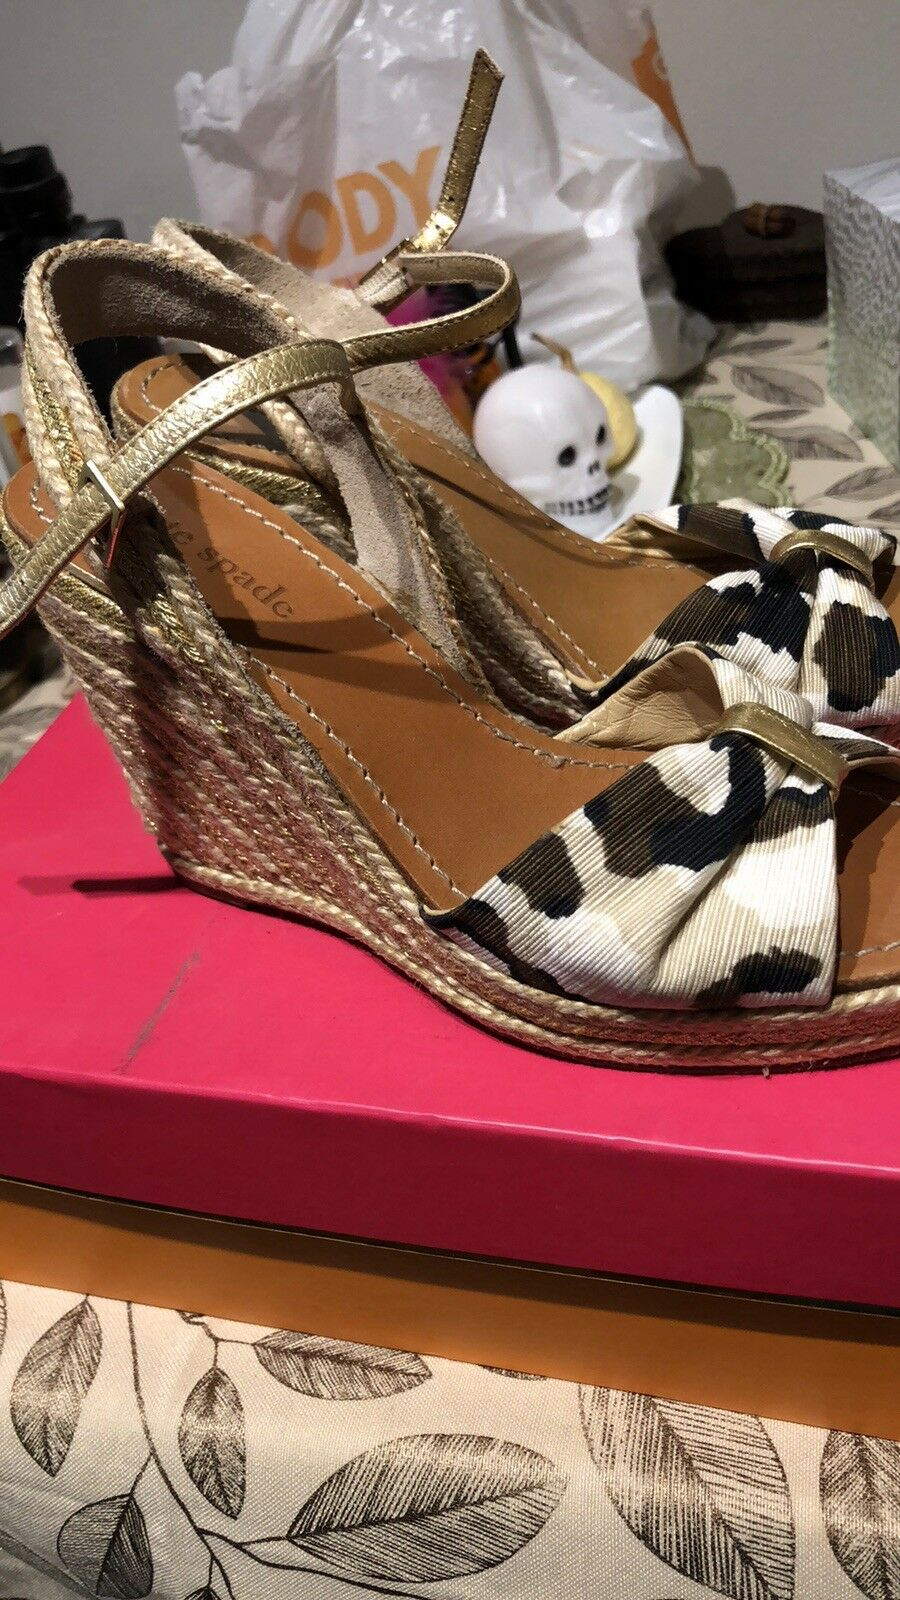 kate spade shoes 6 - image 3